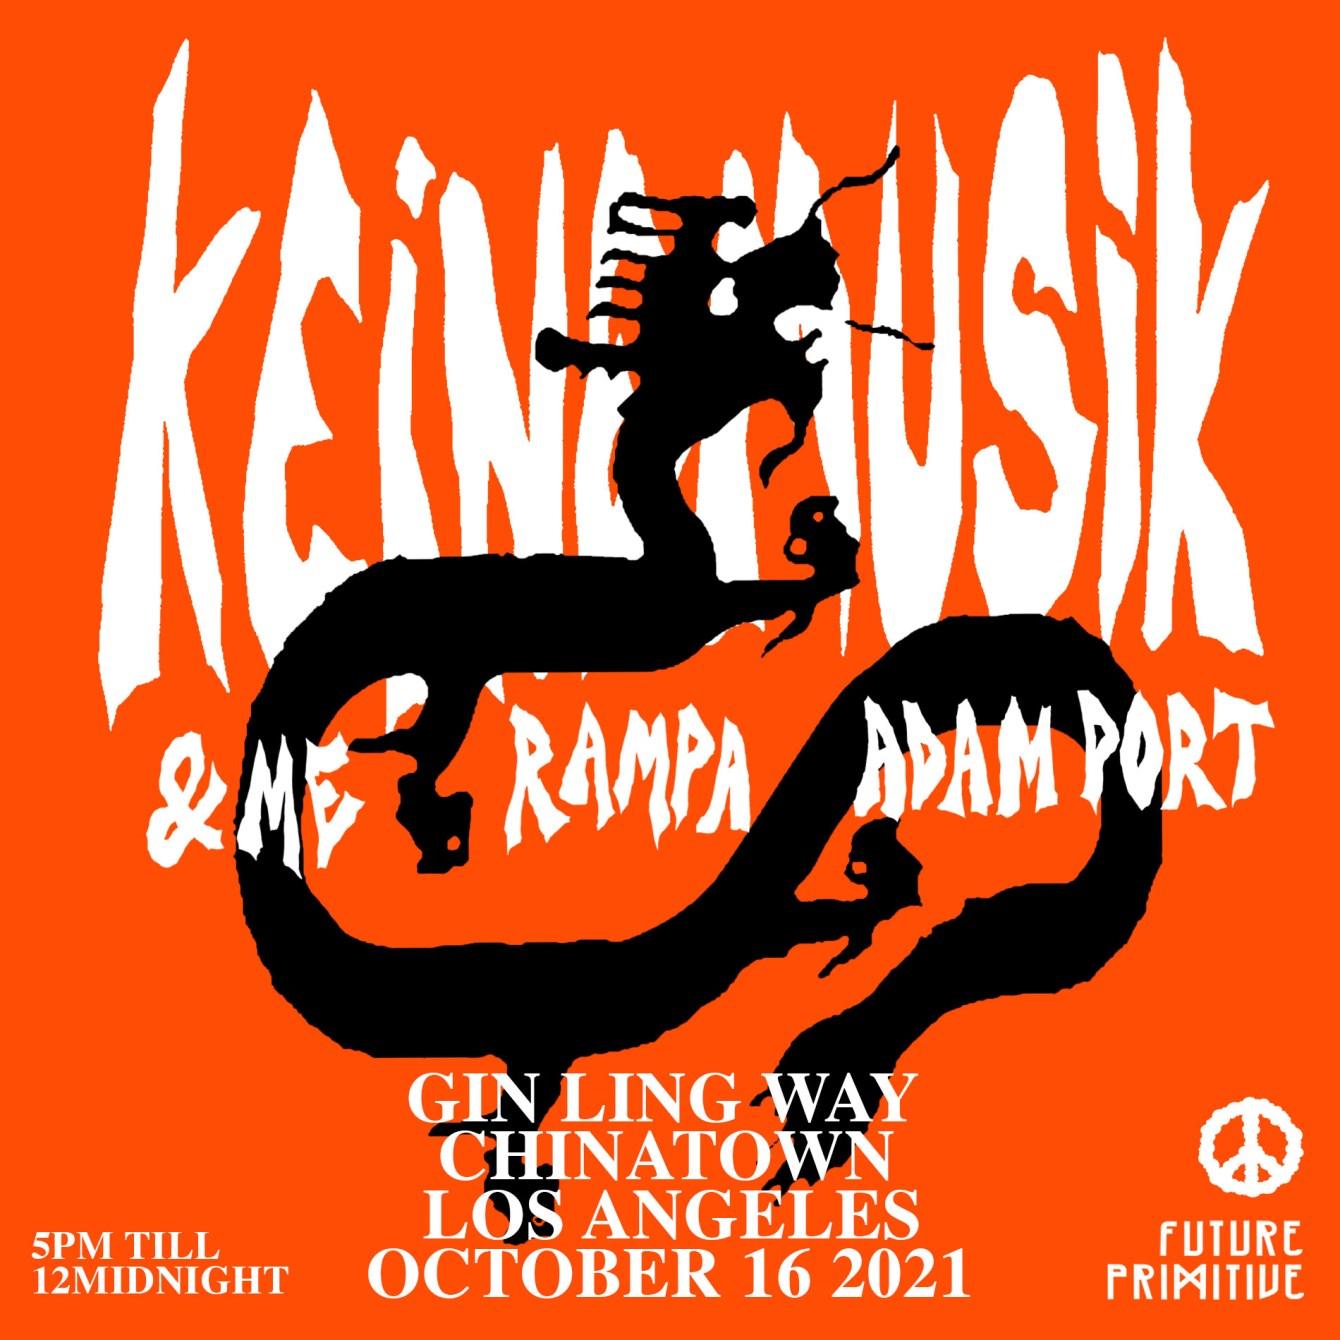 Keinemusik Block Party &ME, Rampa, Adam Port 10/16 - Flyer front